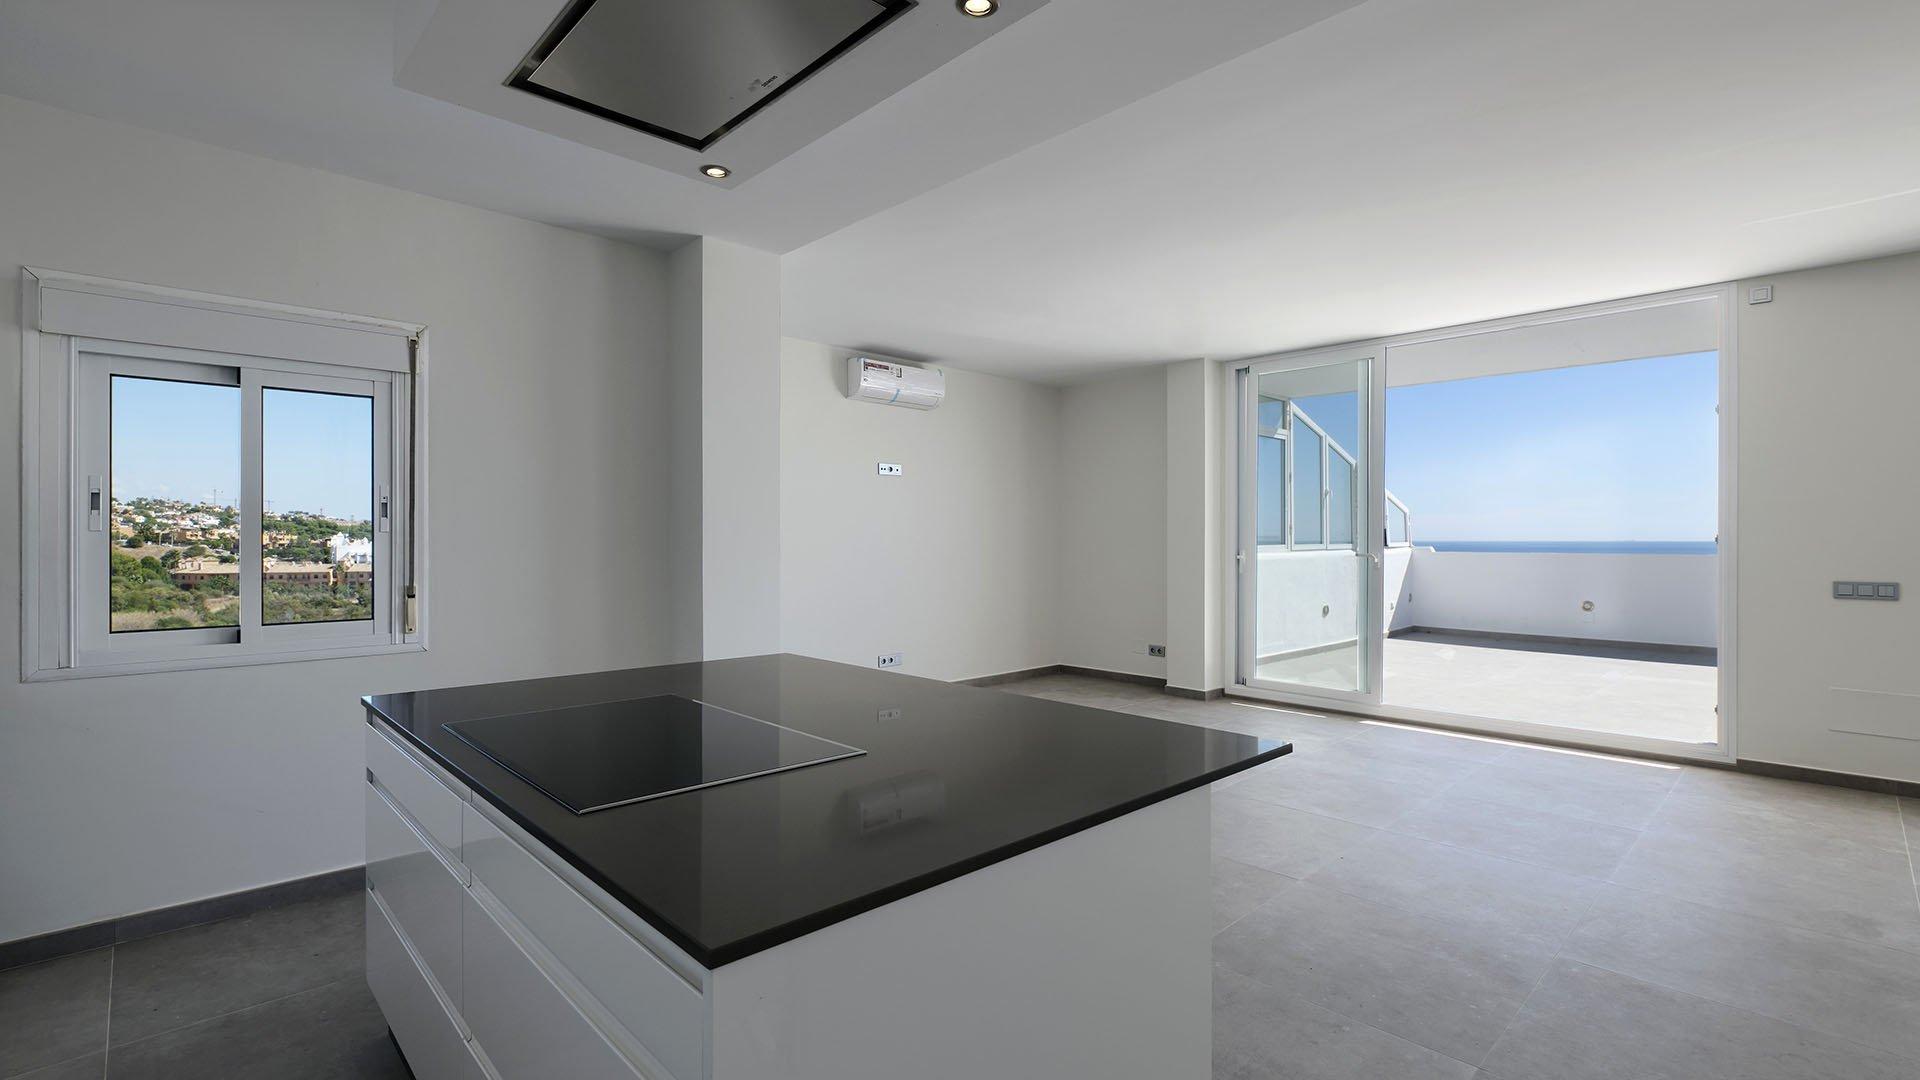 Bahia de Estepona 110: Eerste lijn strand duplex penthouse in Estepona